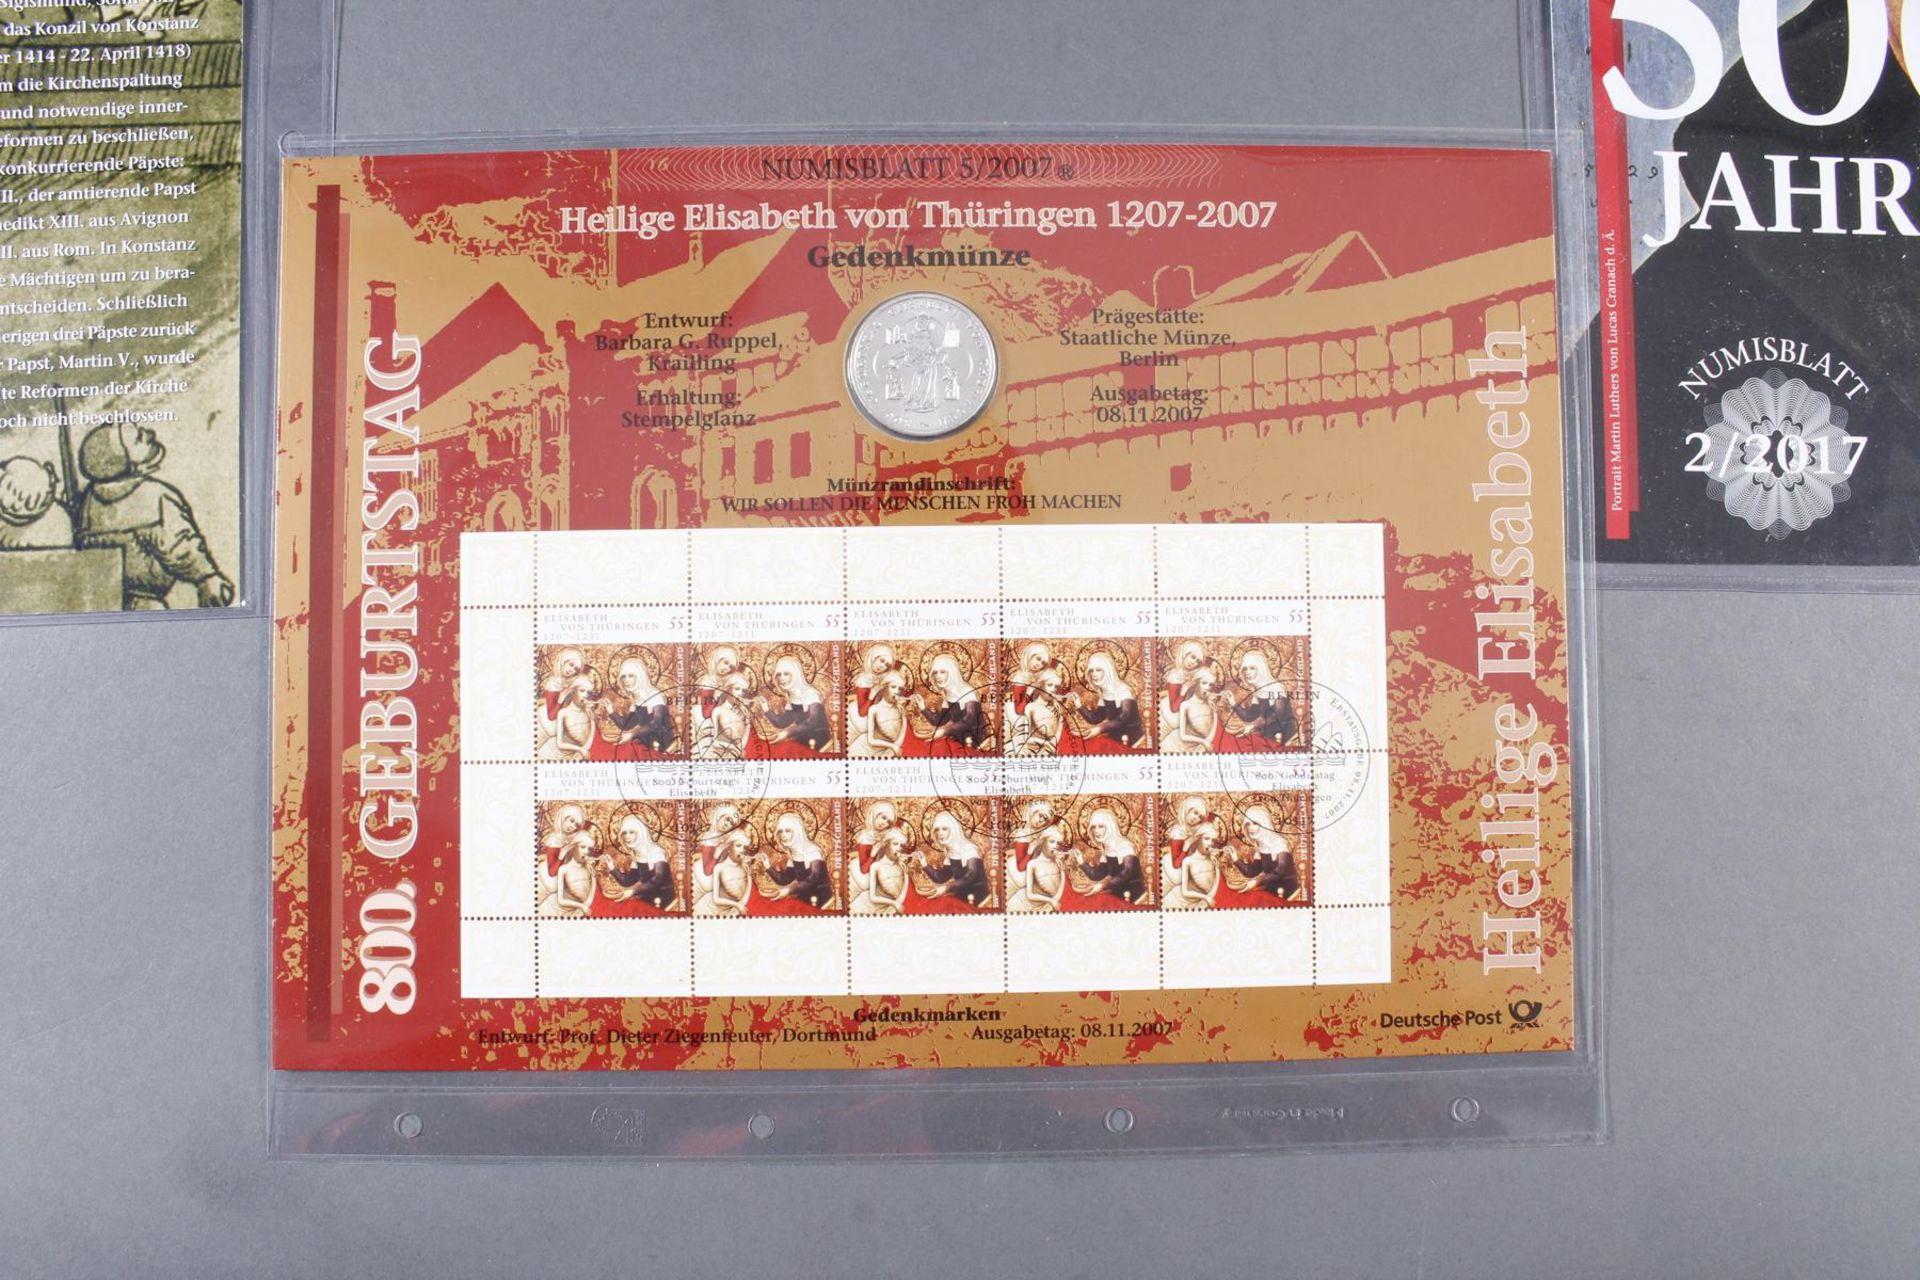 Münzsammlung Thema Vatikan / Kirche; inkl. Euro-Münzen - Bild 2 aus 4